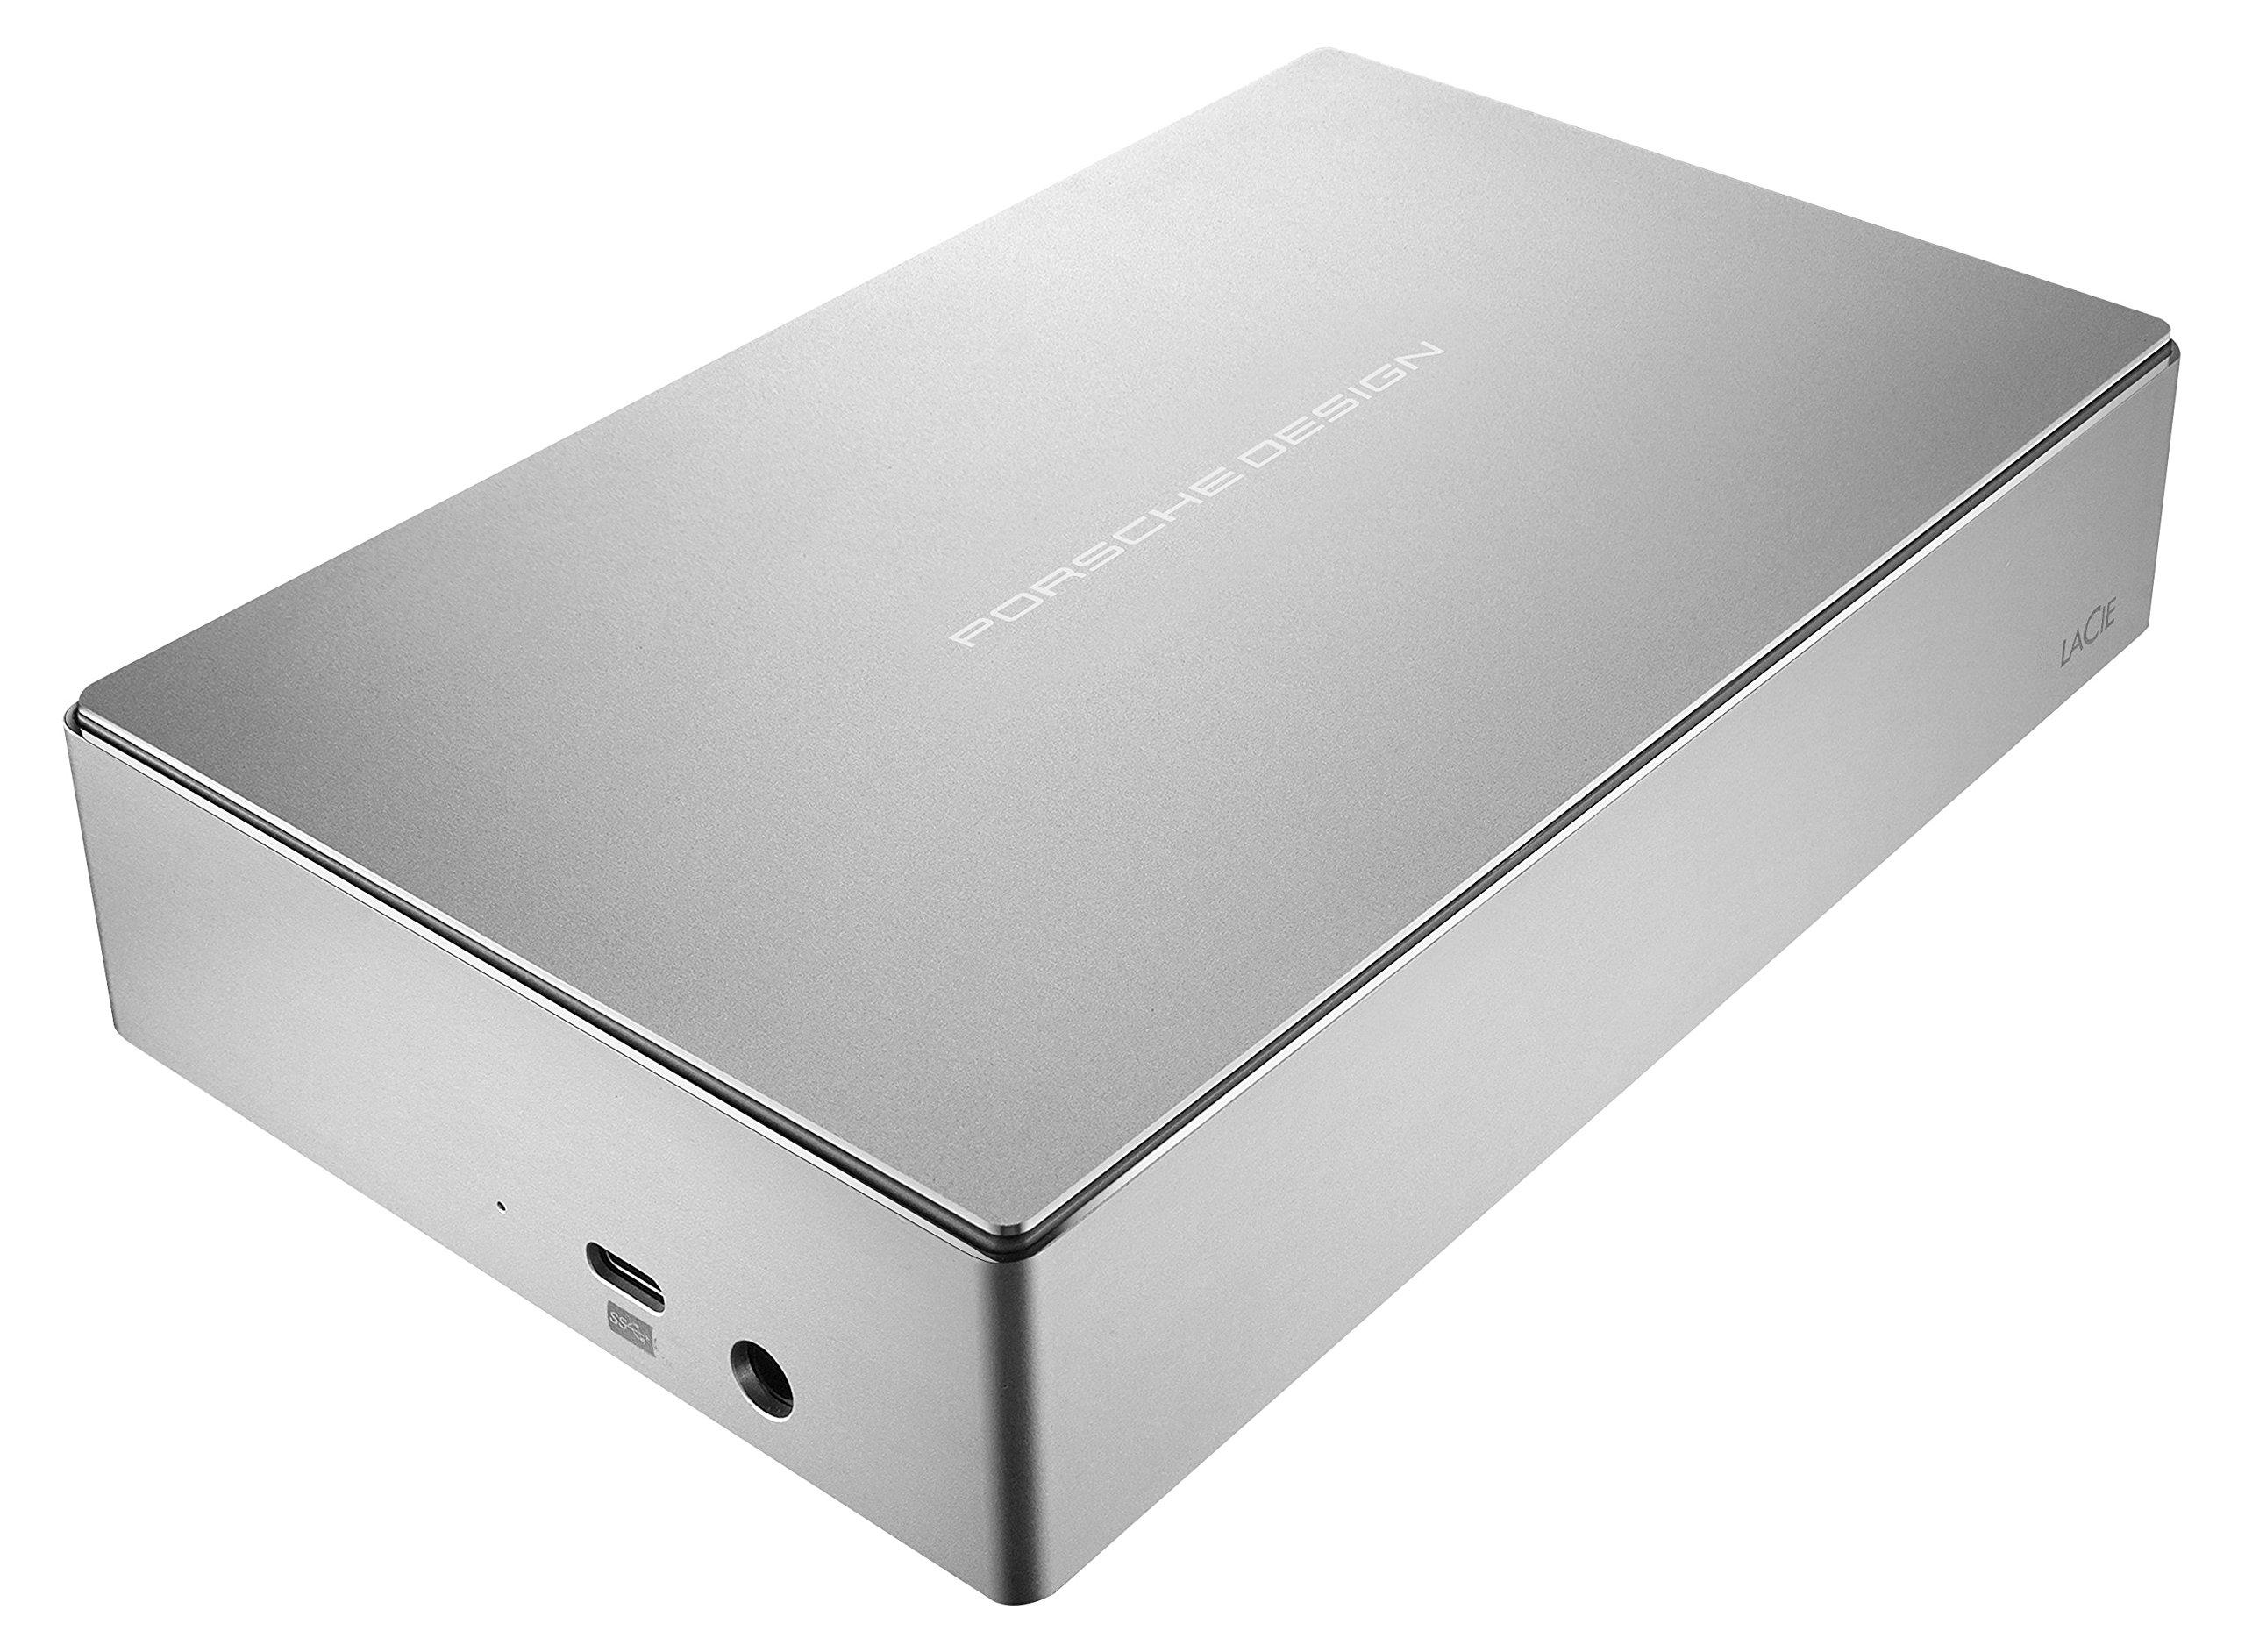 LaCie Porsche Design 8TB USB-C Desktop Hard Drive, Silver (STFE8000100)